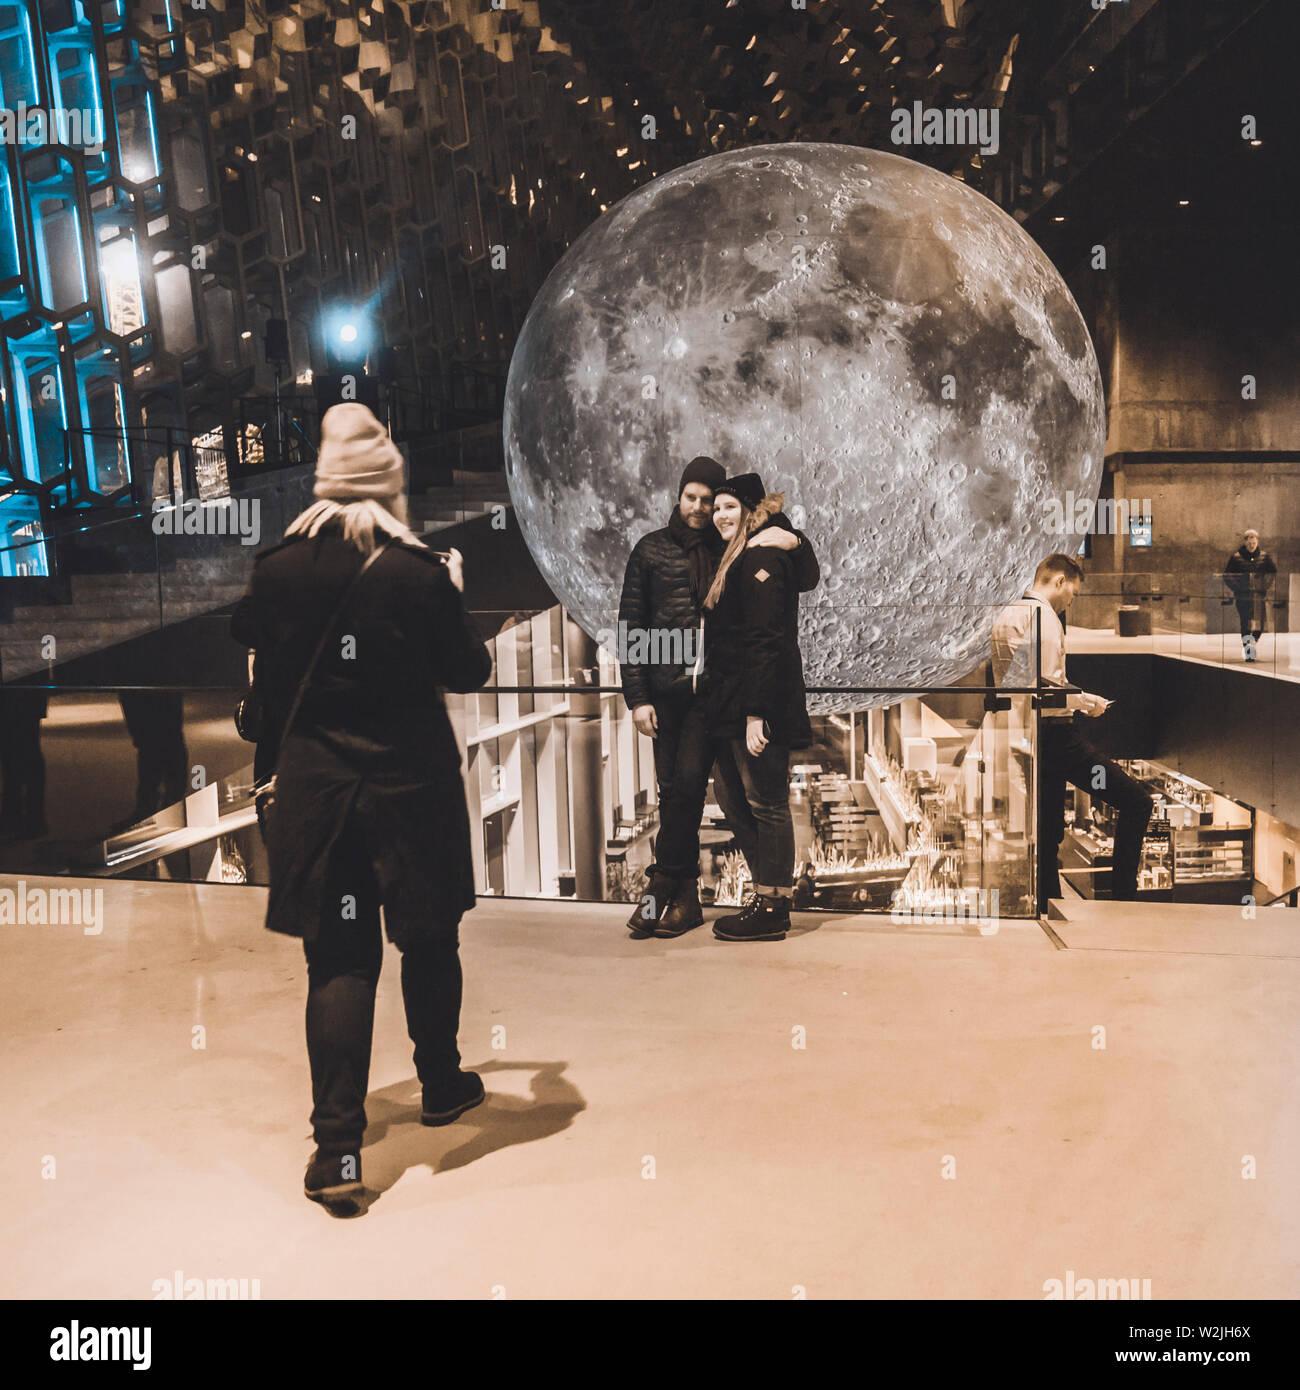 Museum of the Moon, art piece, by Installation artist Luke Jerram during The Winter Lights Festival, Harpa, Reykjavik, Iceland. - Stock Image